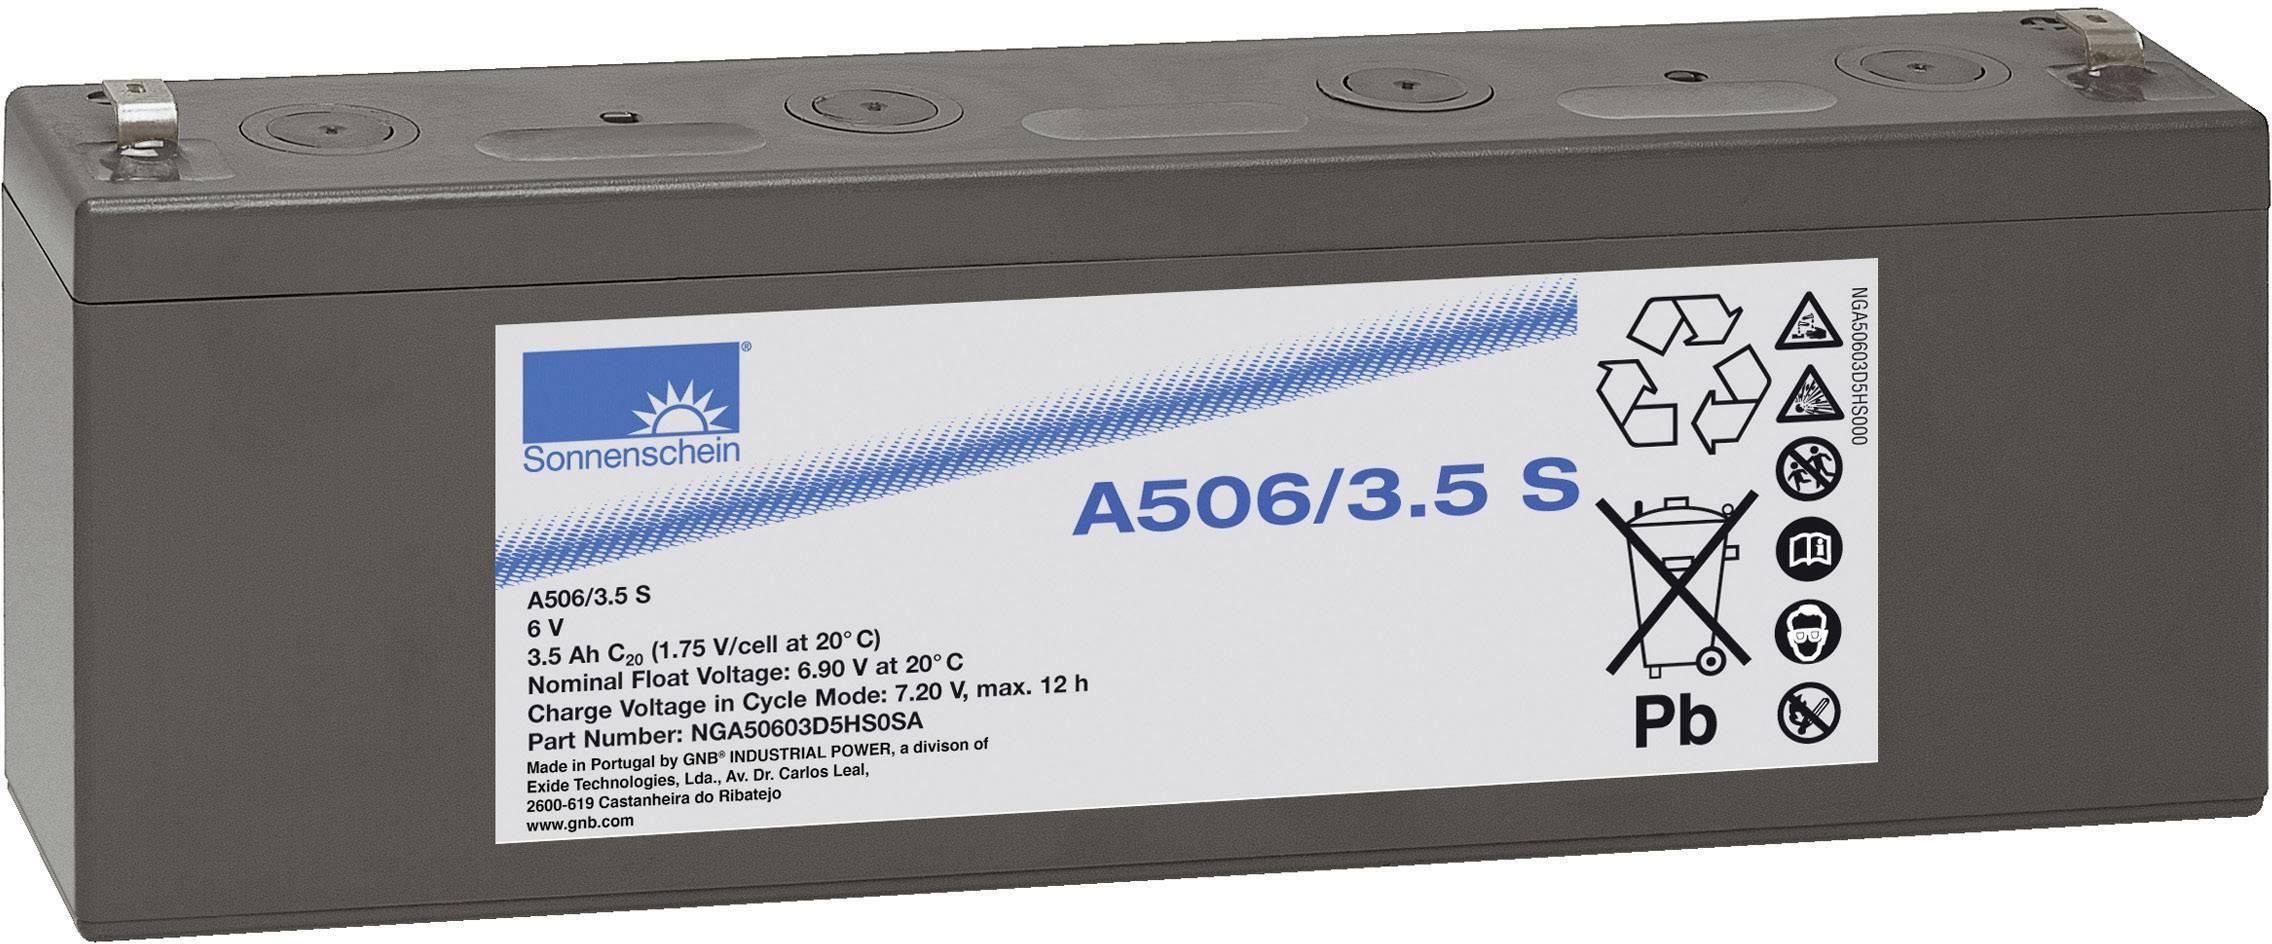 Olovený akumulátor GNB Sonnenschein A506/3,5 S NGA50603D5HS0SA, 3.5 Ah, 6 V